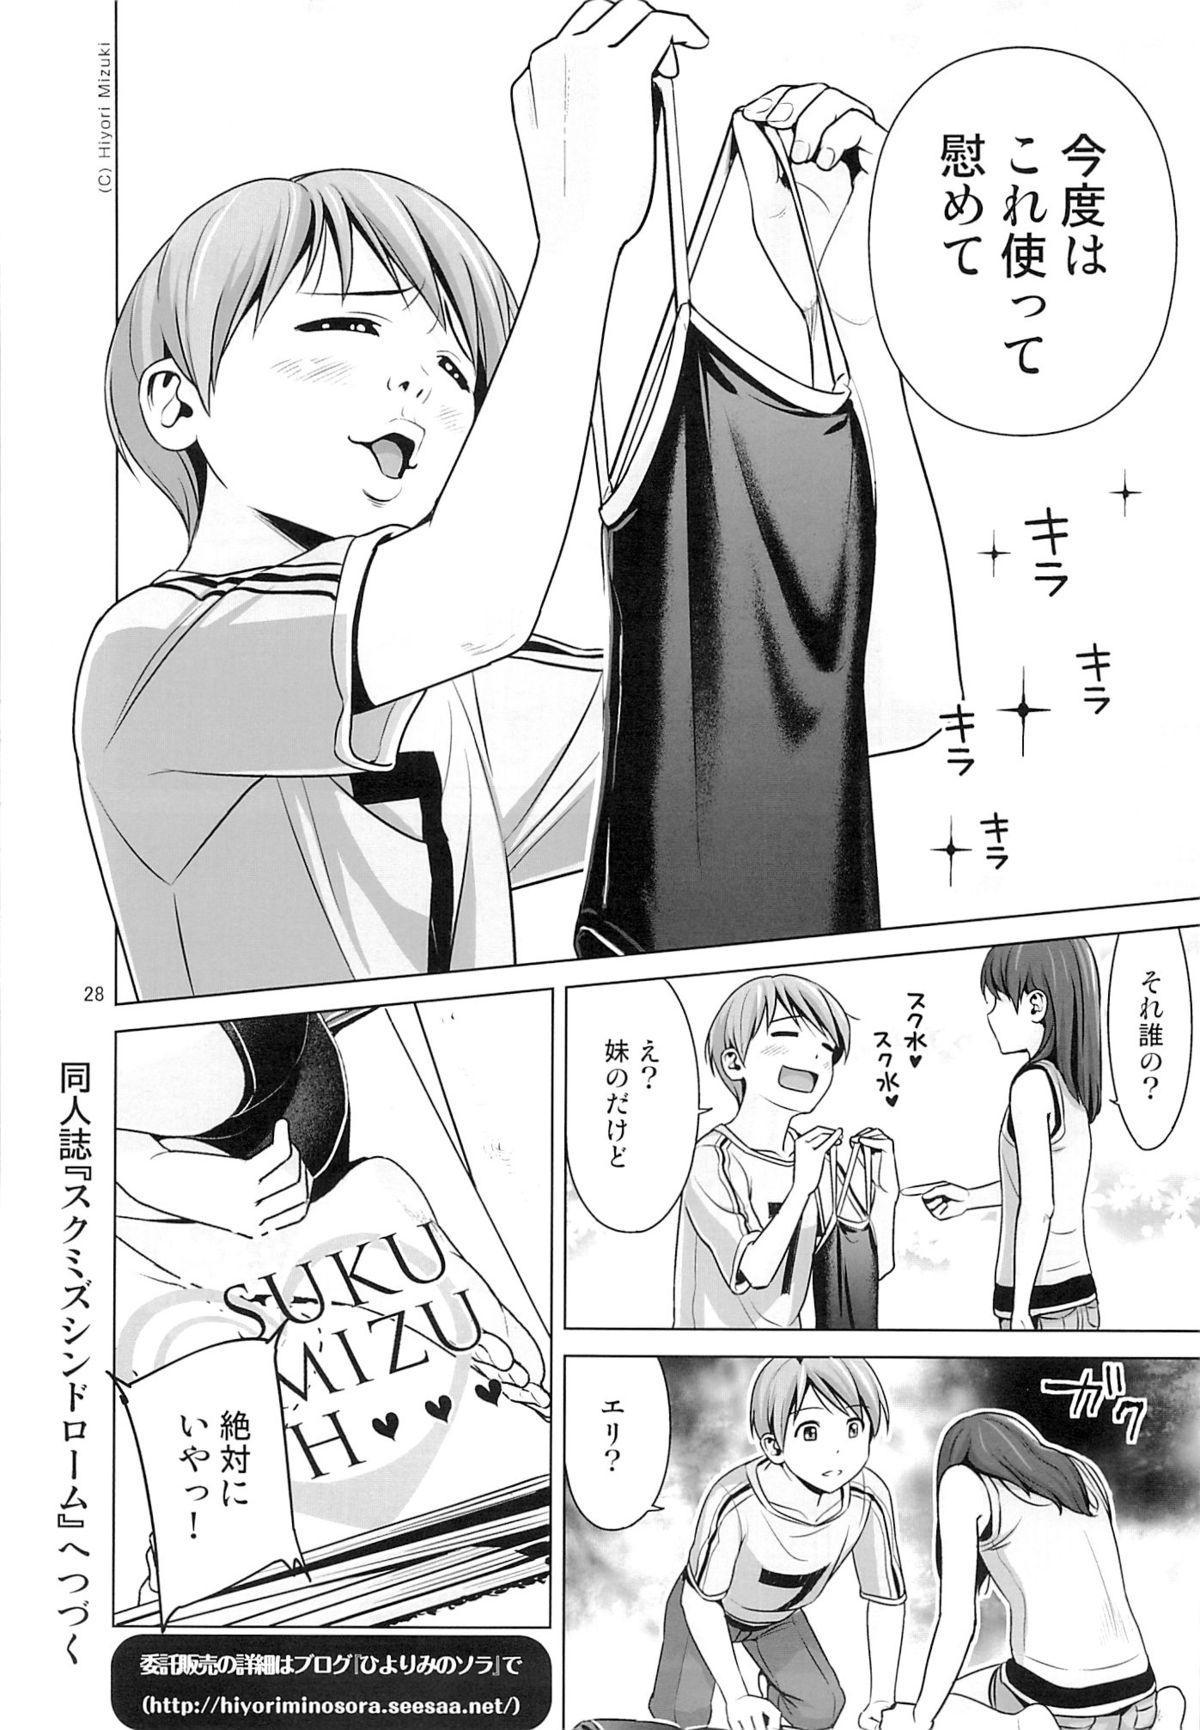 Hairo-ism Sukumizu Syndrome Vol. 0 28